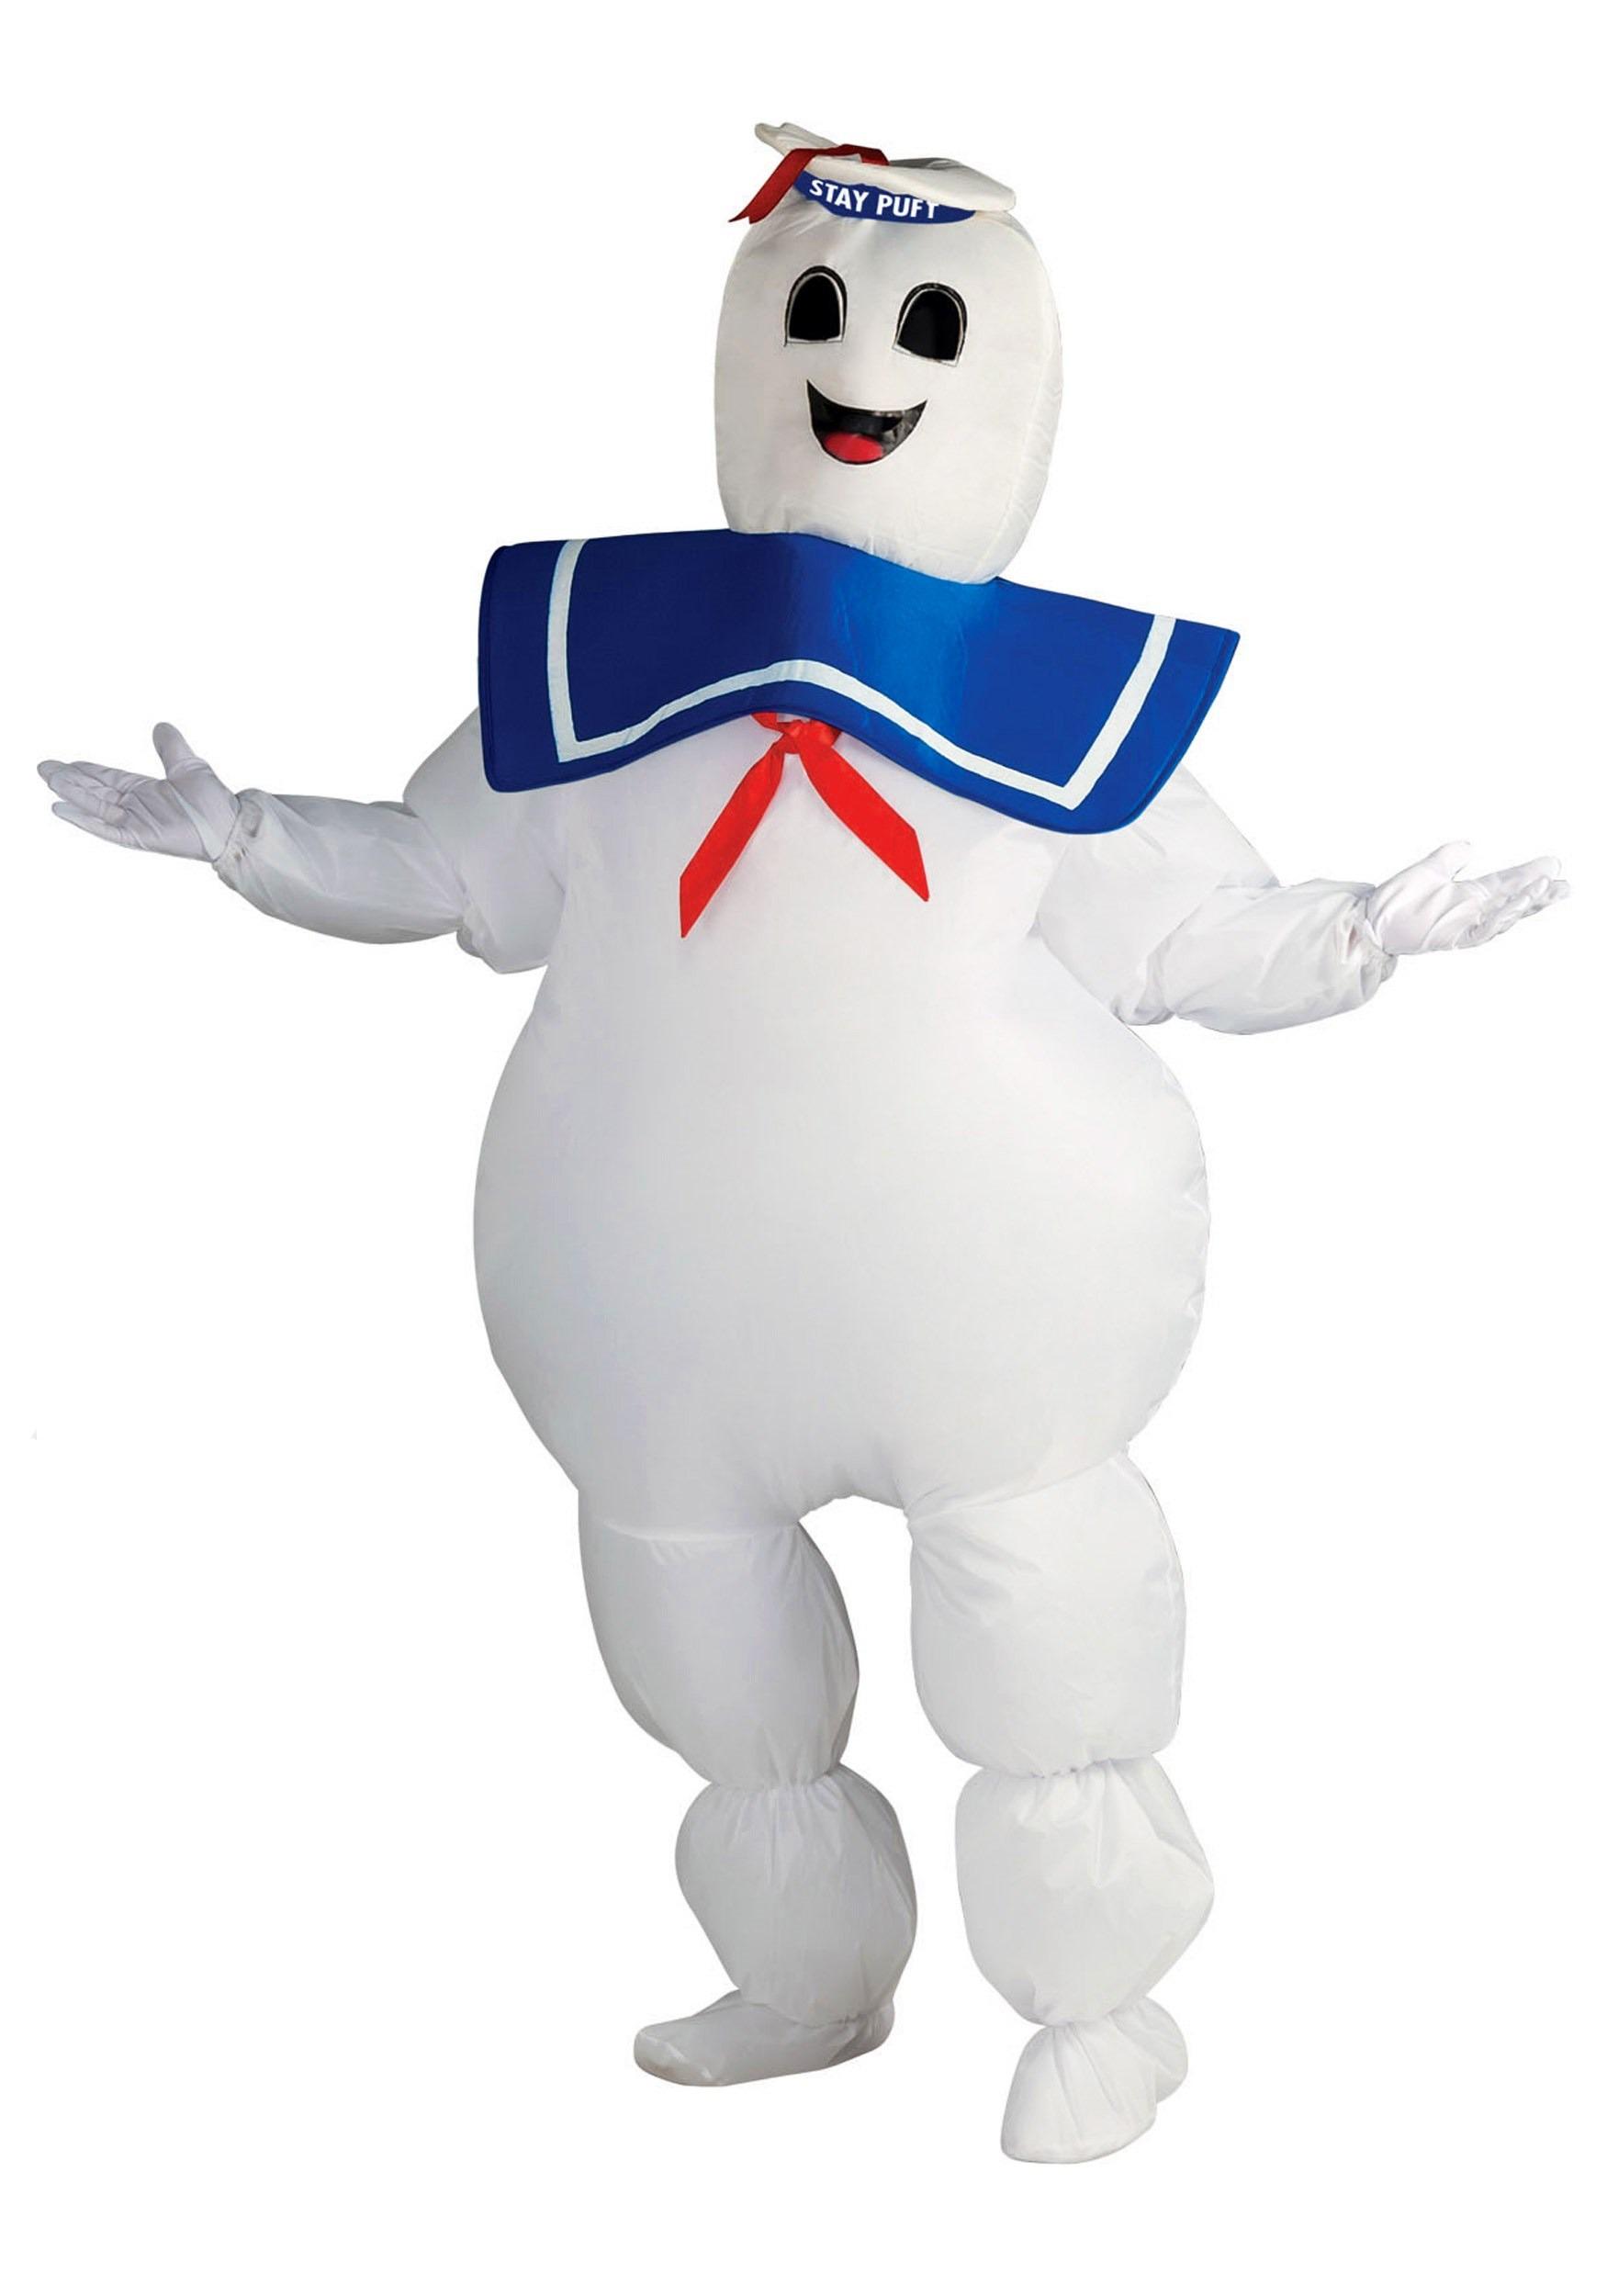 Ghostbuster Marshmallow Men's Costume RU889832